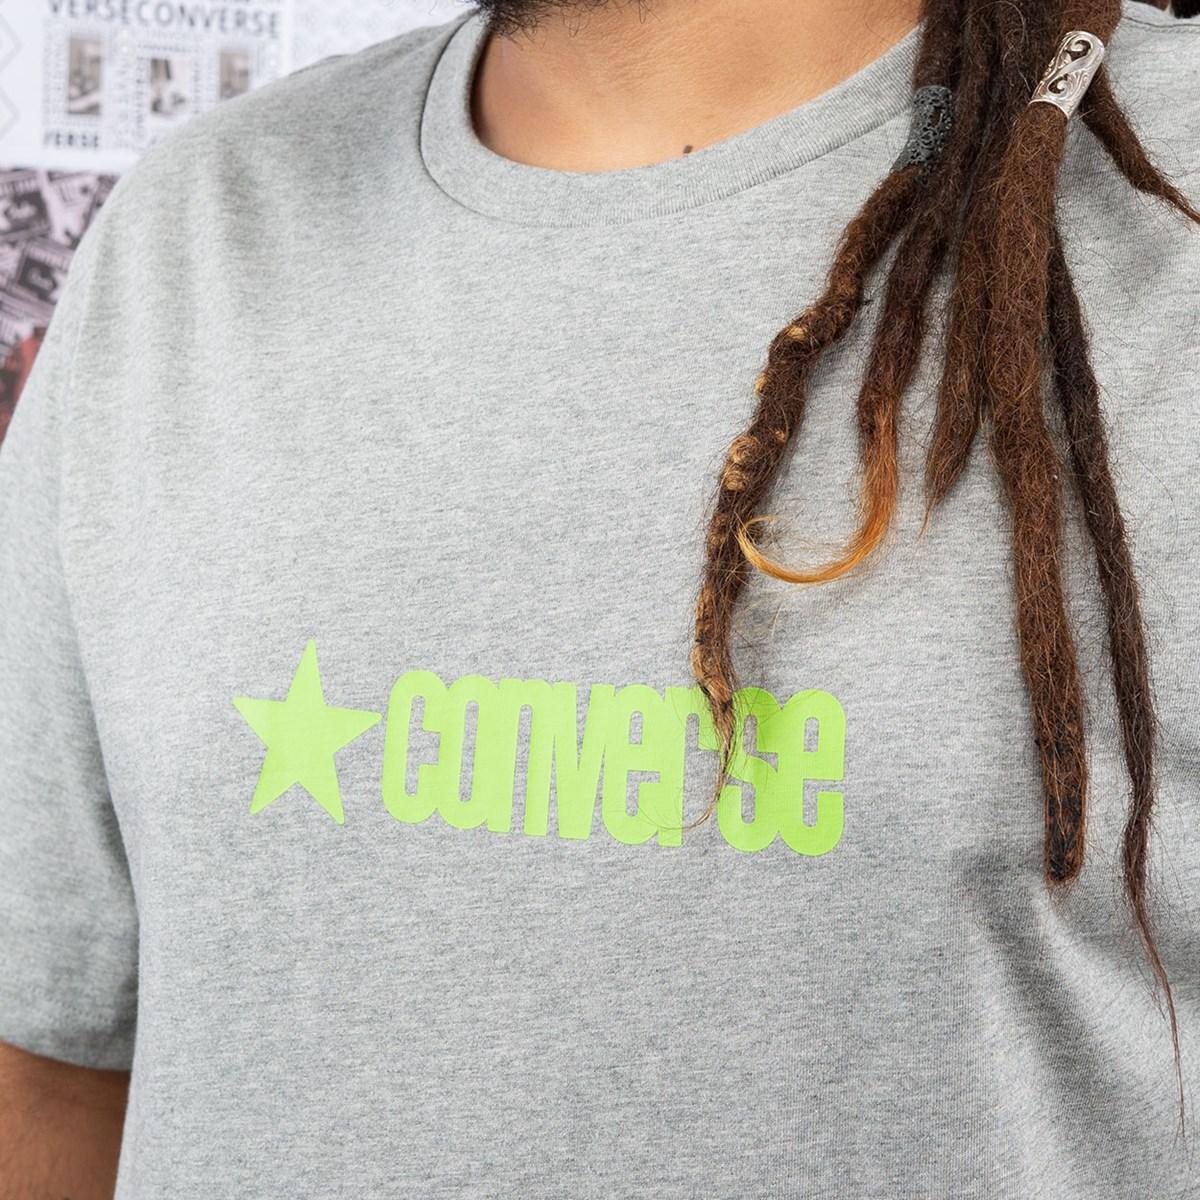 Camiseta Converse Retro Font Workmark SS Gray Vgh 10020528-A03